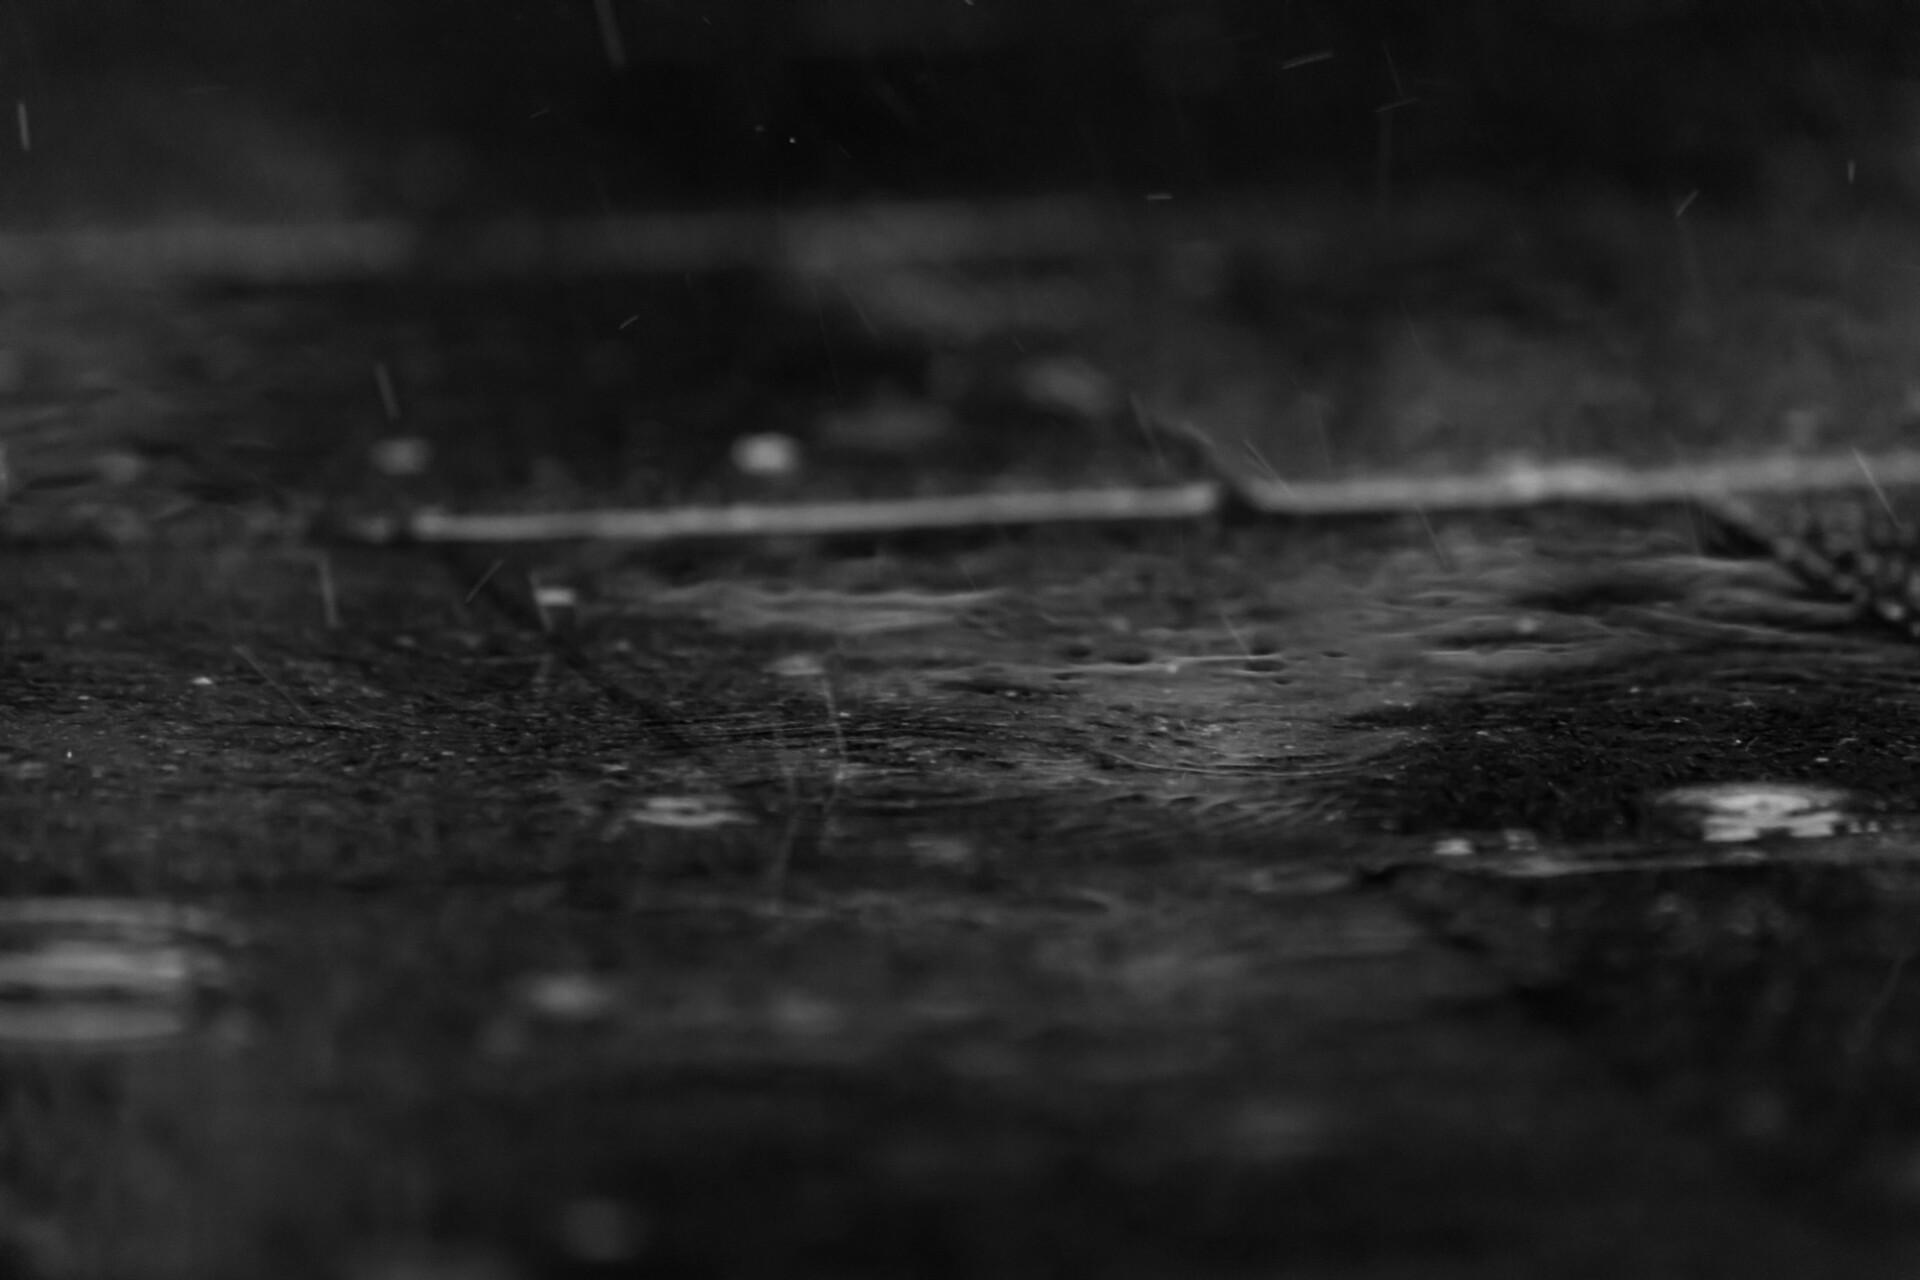 rain puddle black and white